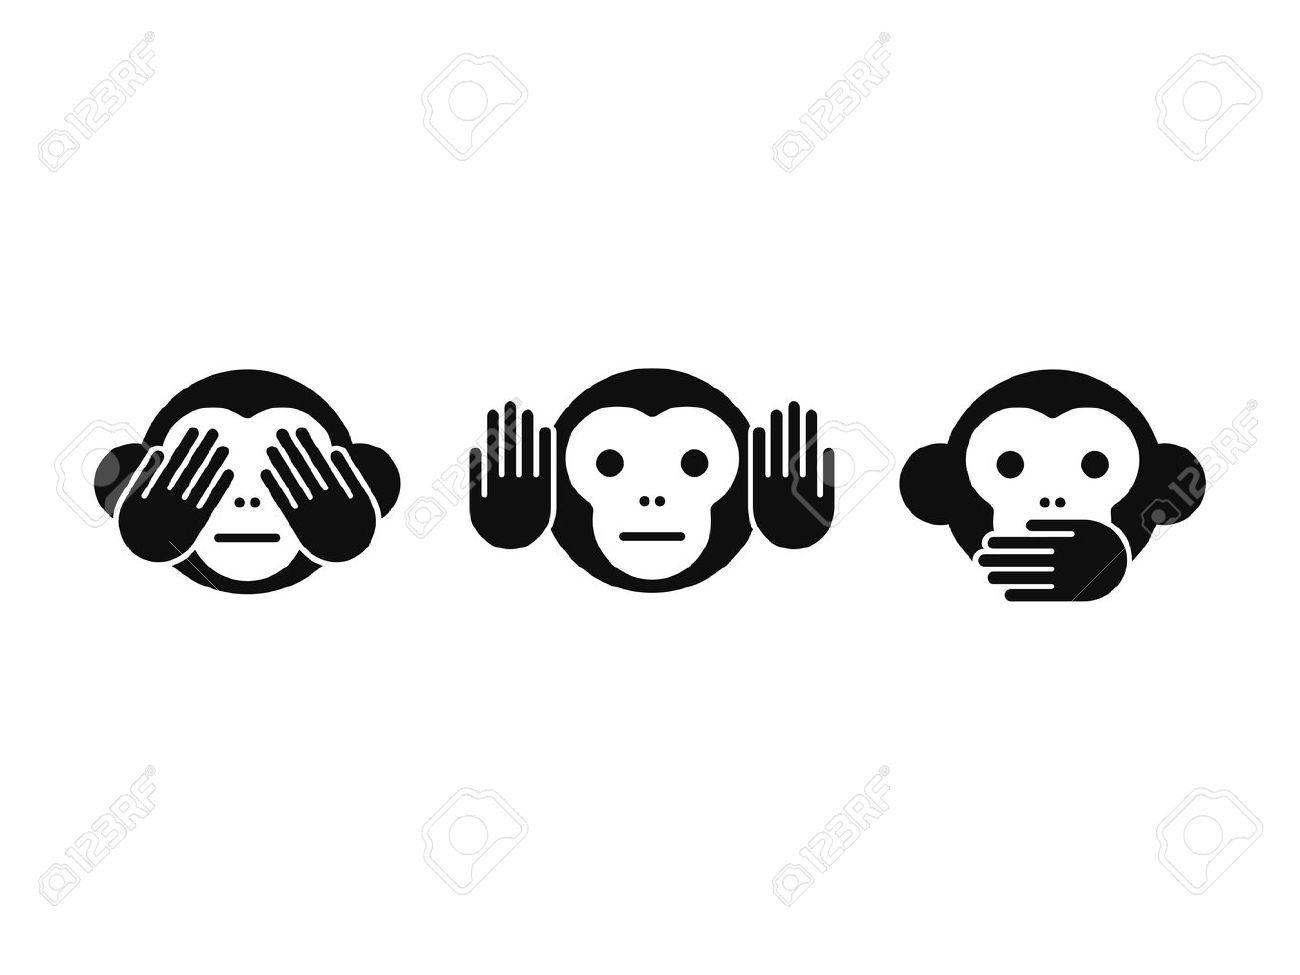 See no evil hear no evil speak no evil monkey icon set simple